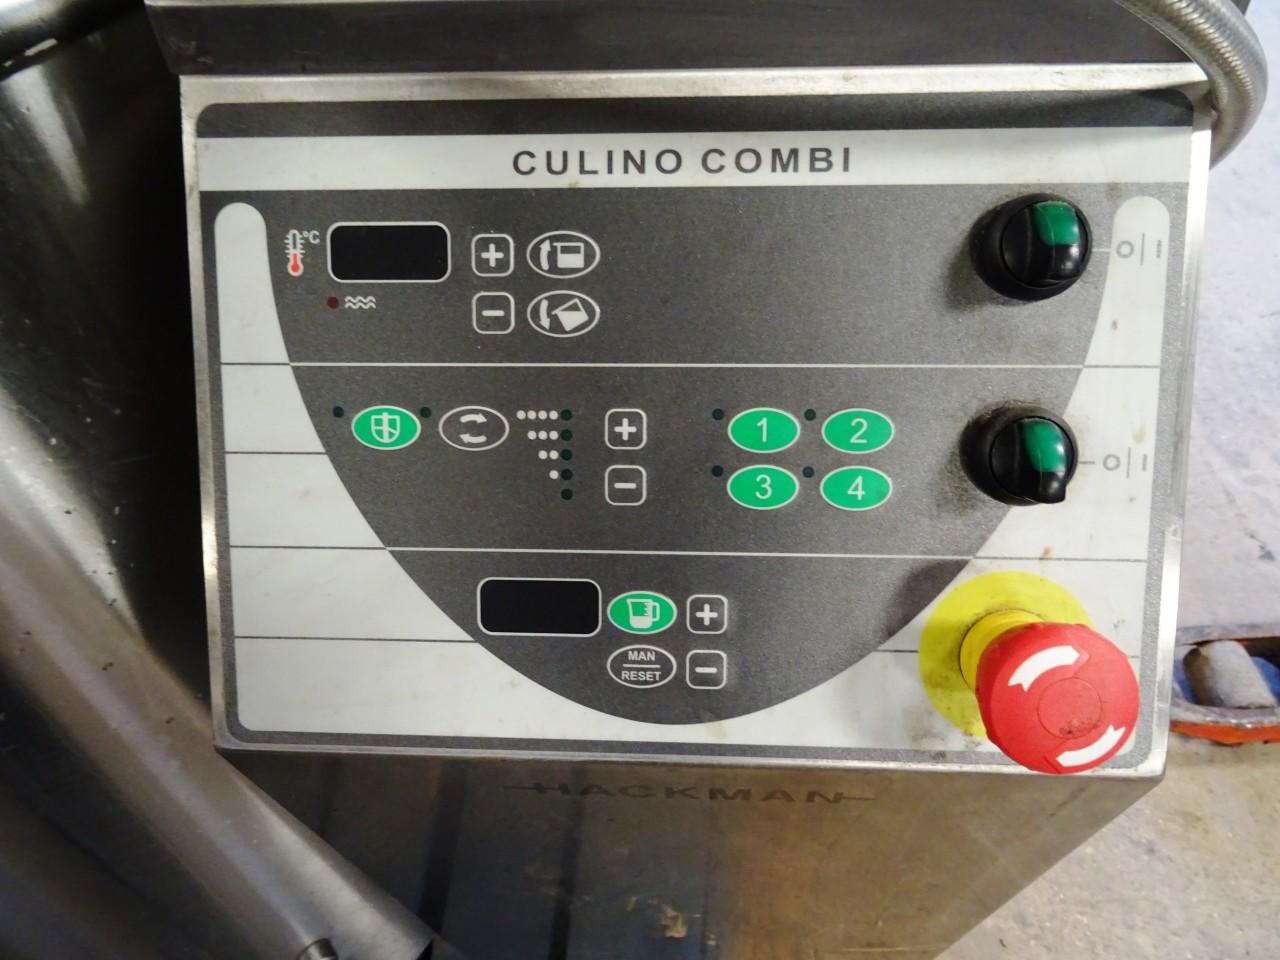 HACKMAN CULINO 100 Litre Electric Tilt Kettle with Sitirrer